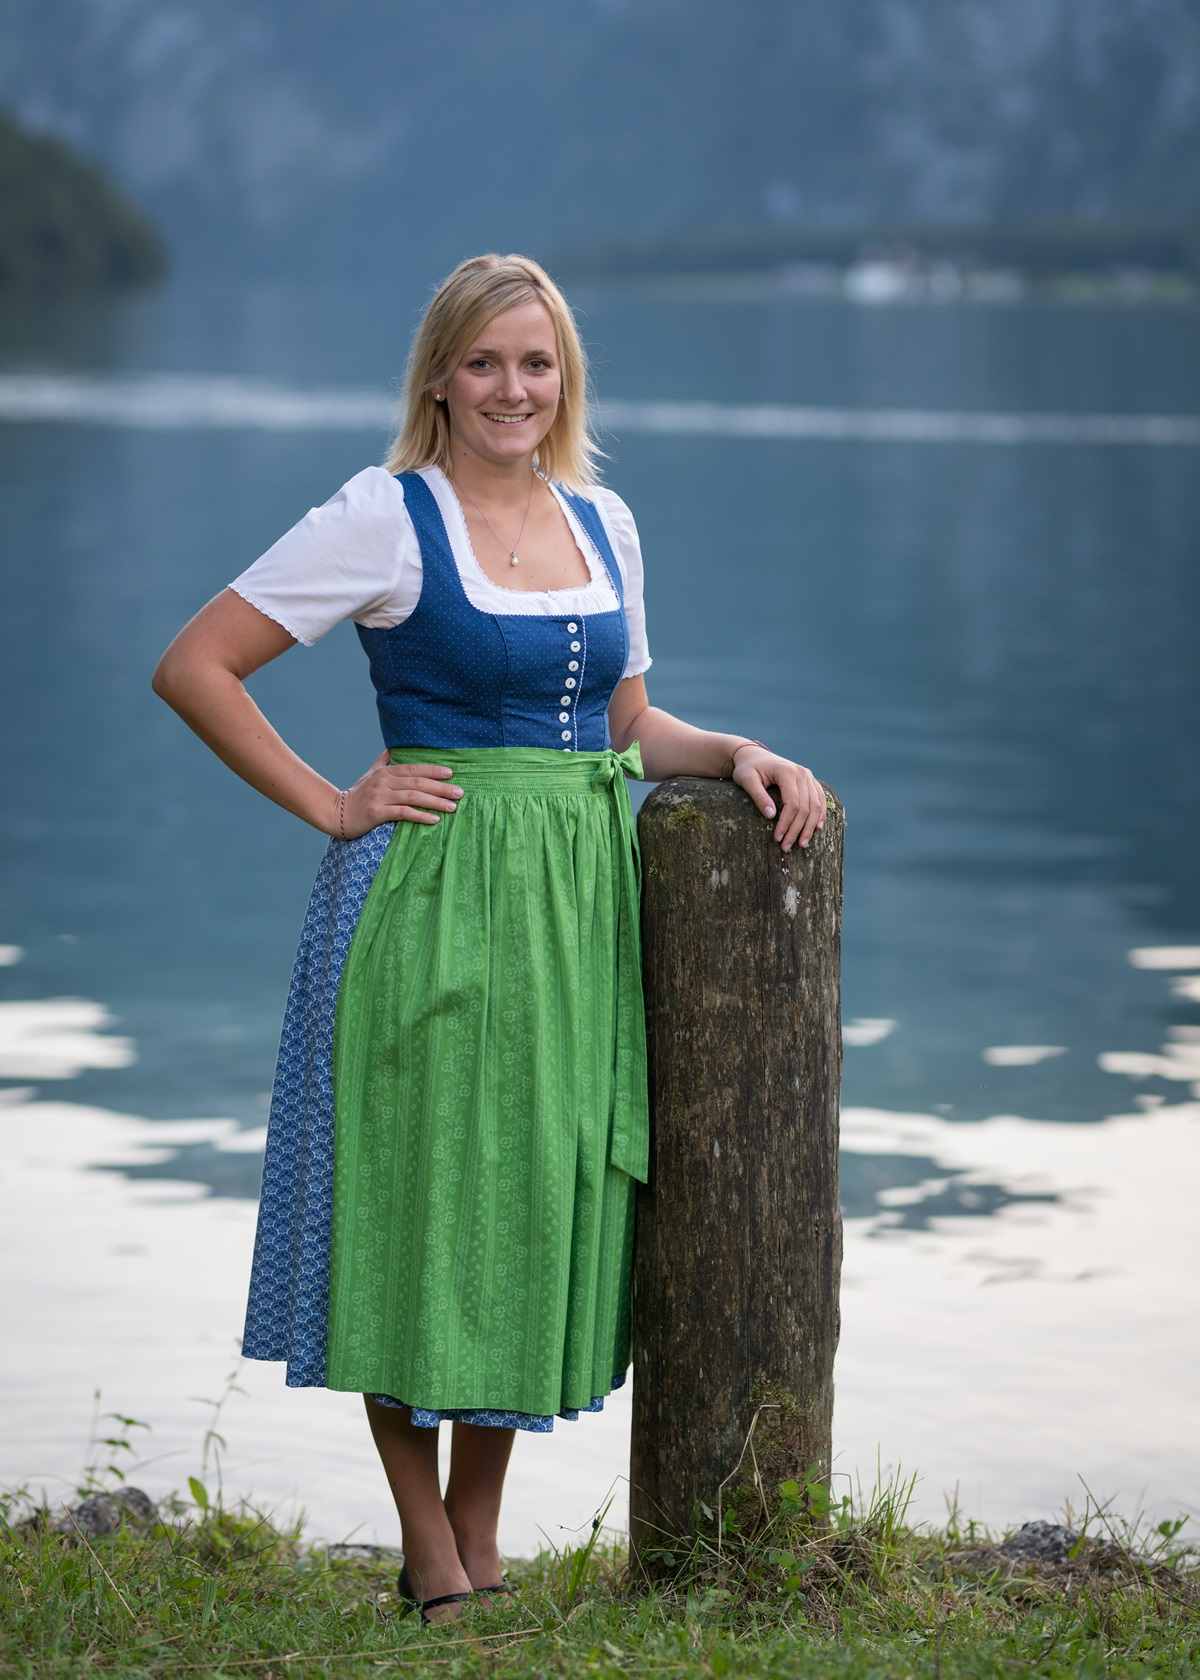 Lisa Schelble